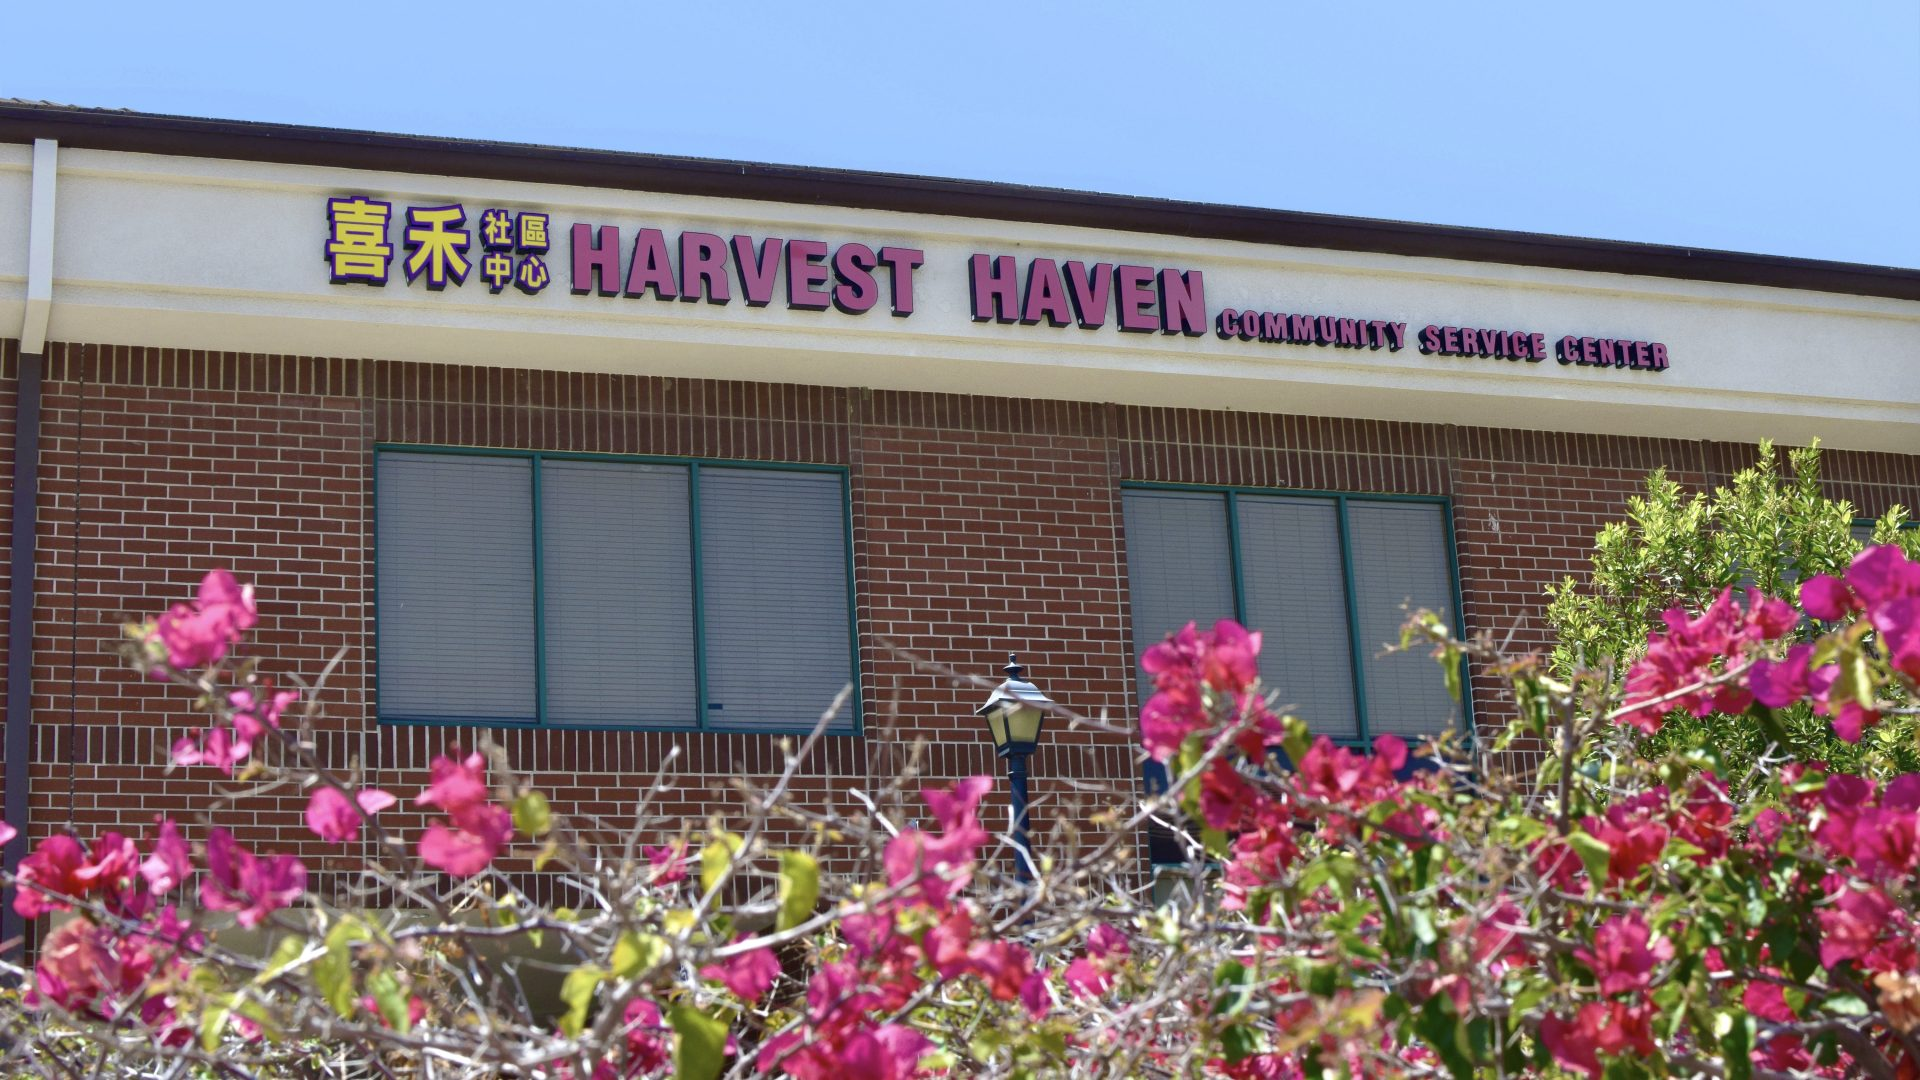 Harvest Haven